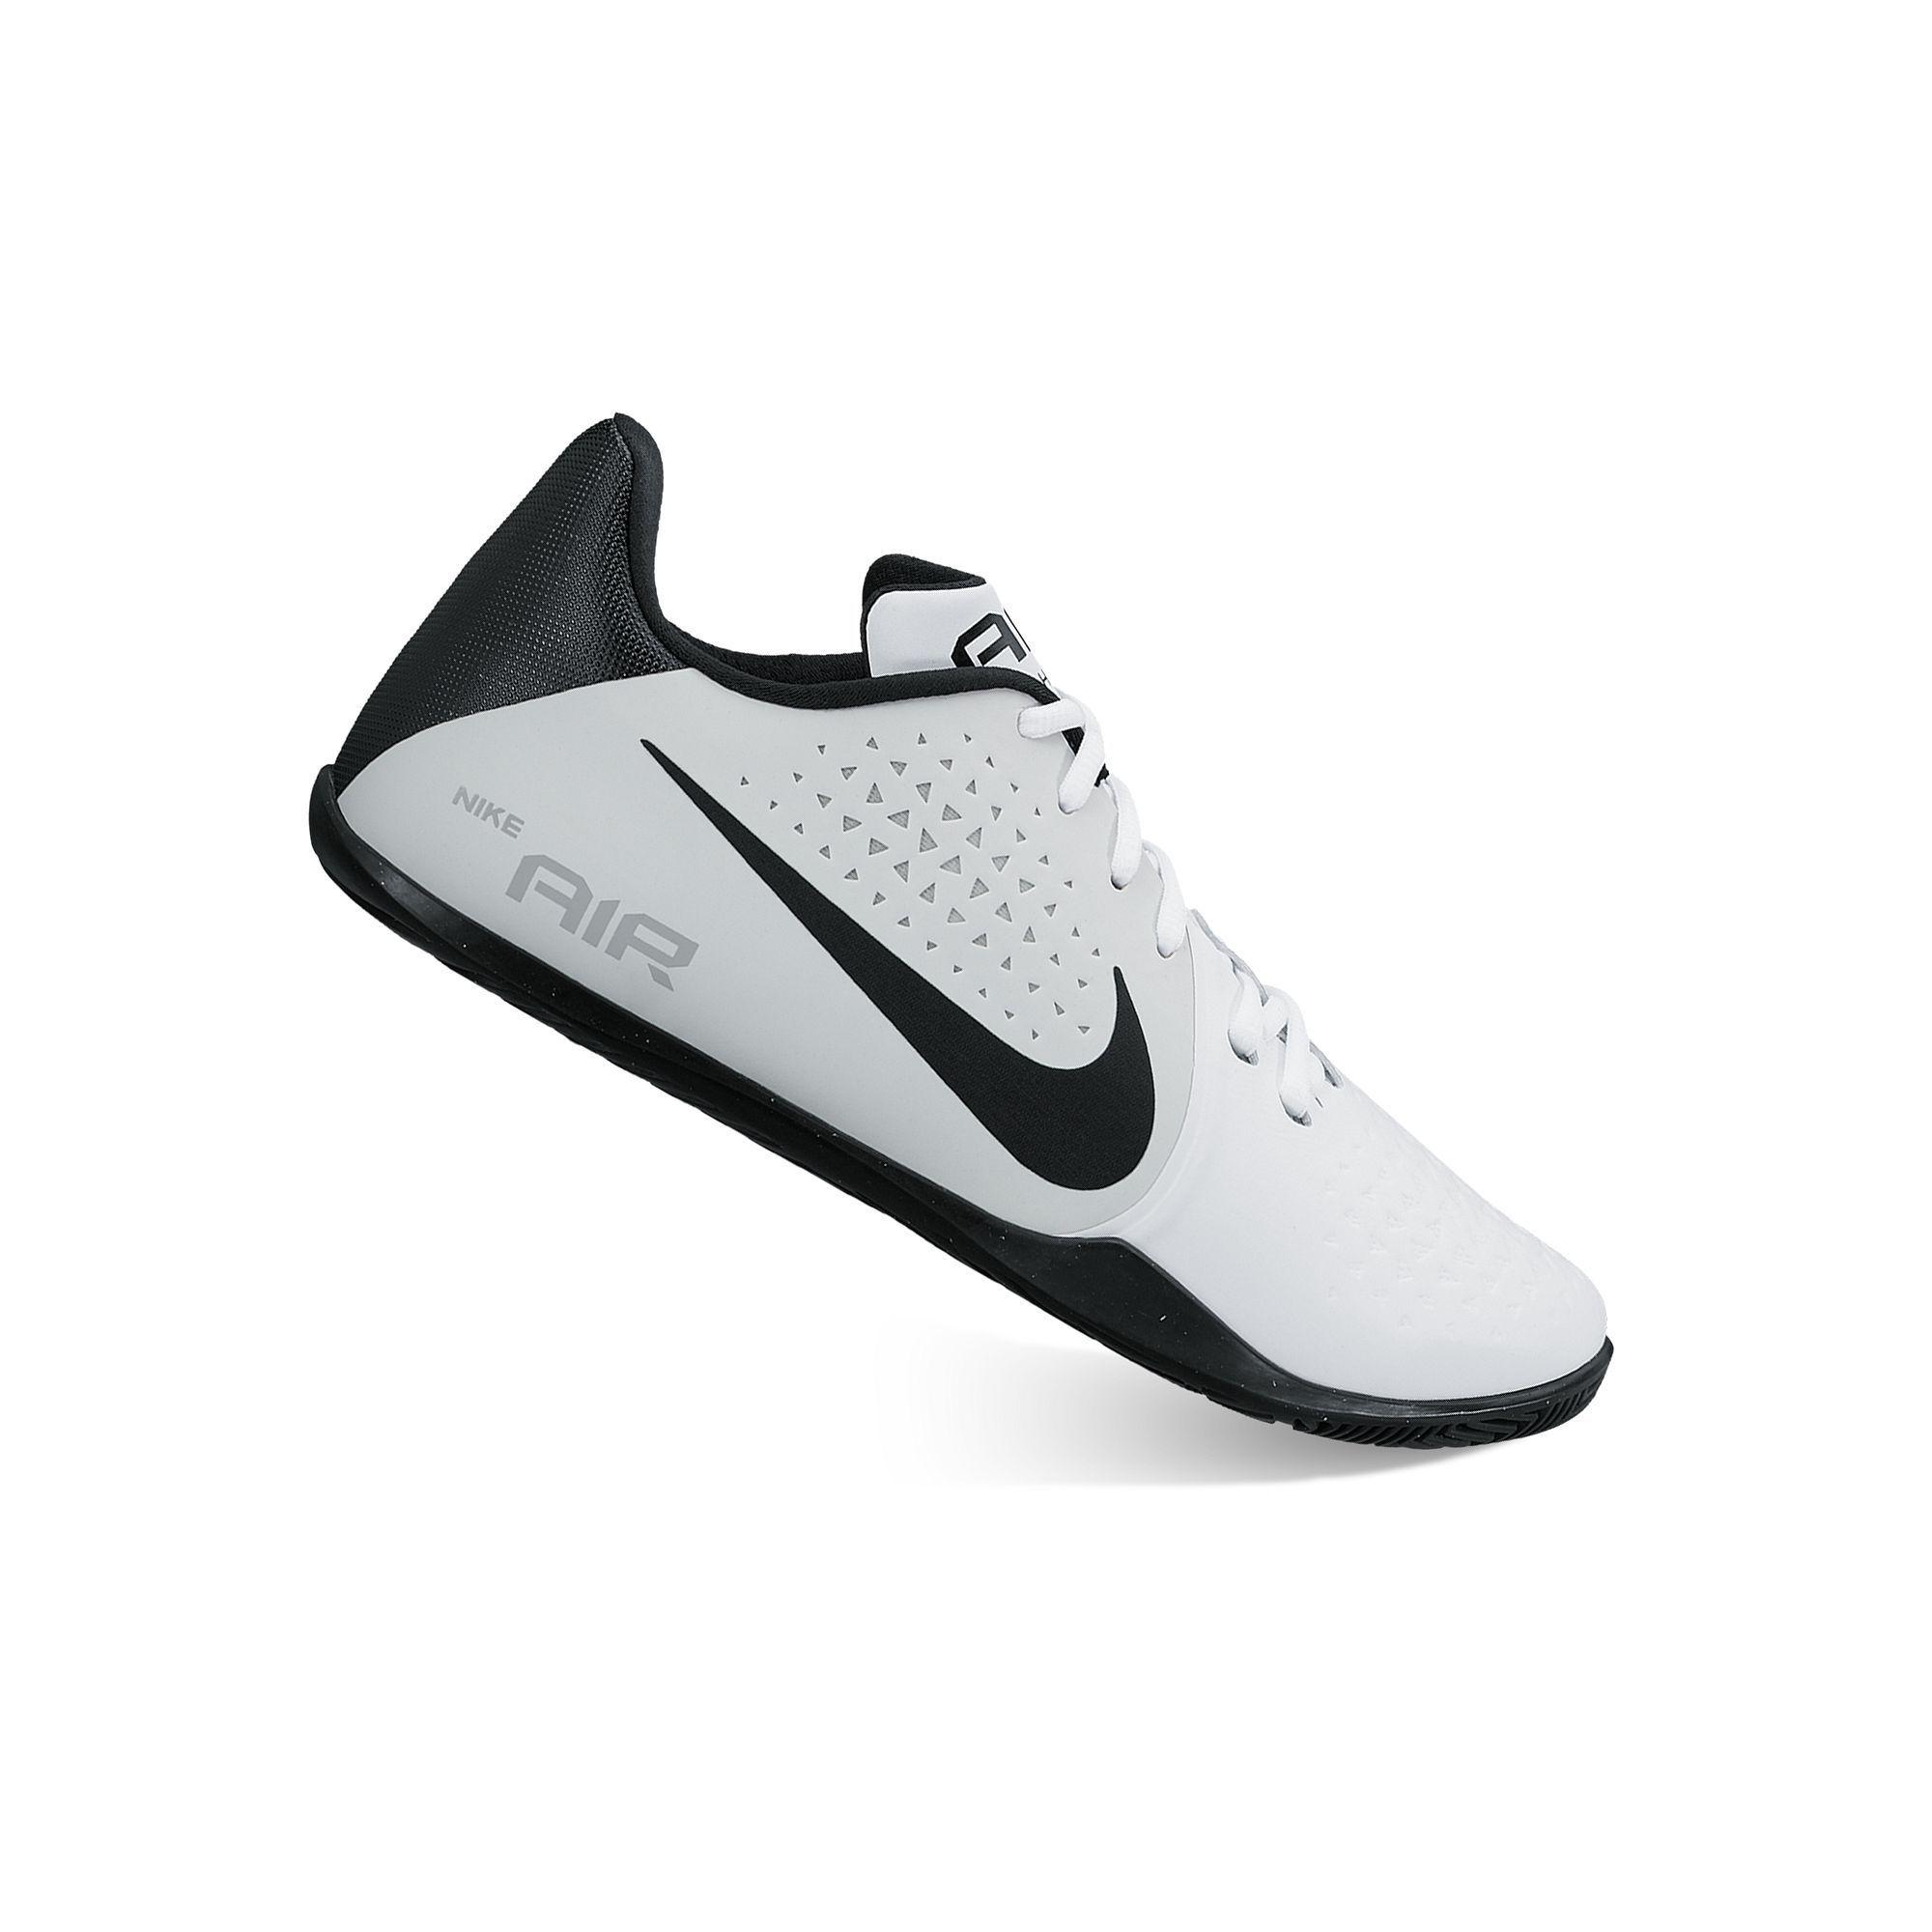 Pas Cher Nike Free Run 2 Jalapenos Noir Et Blanc